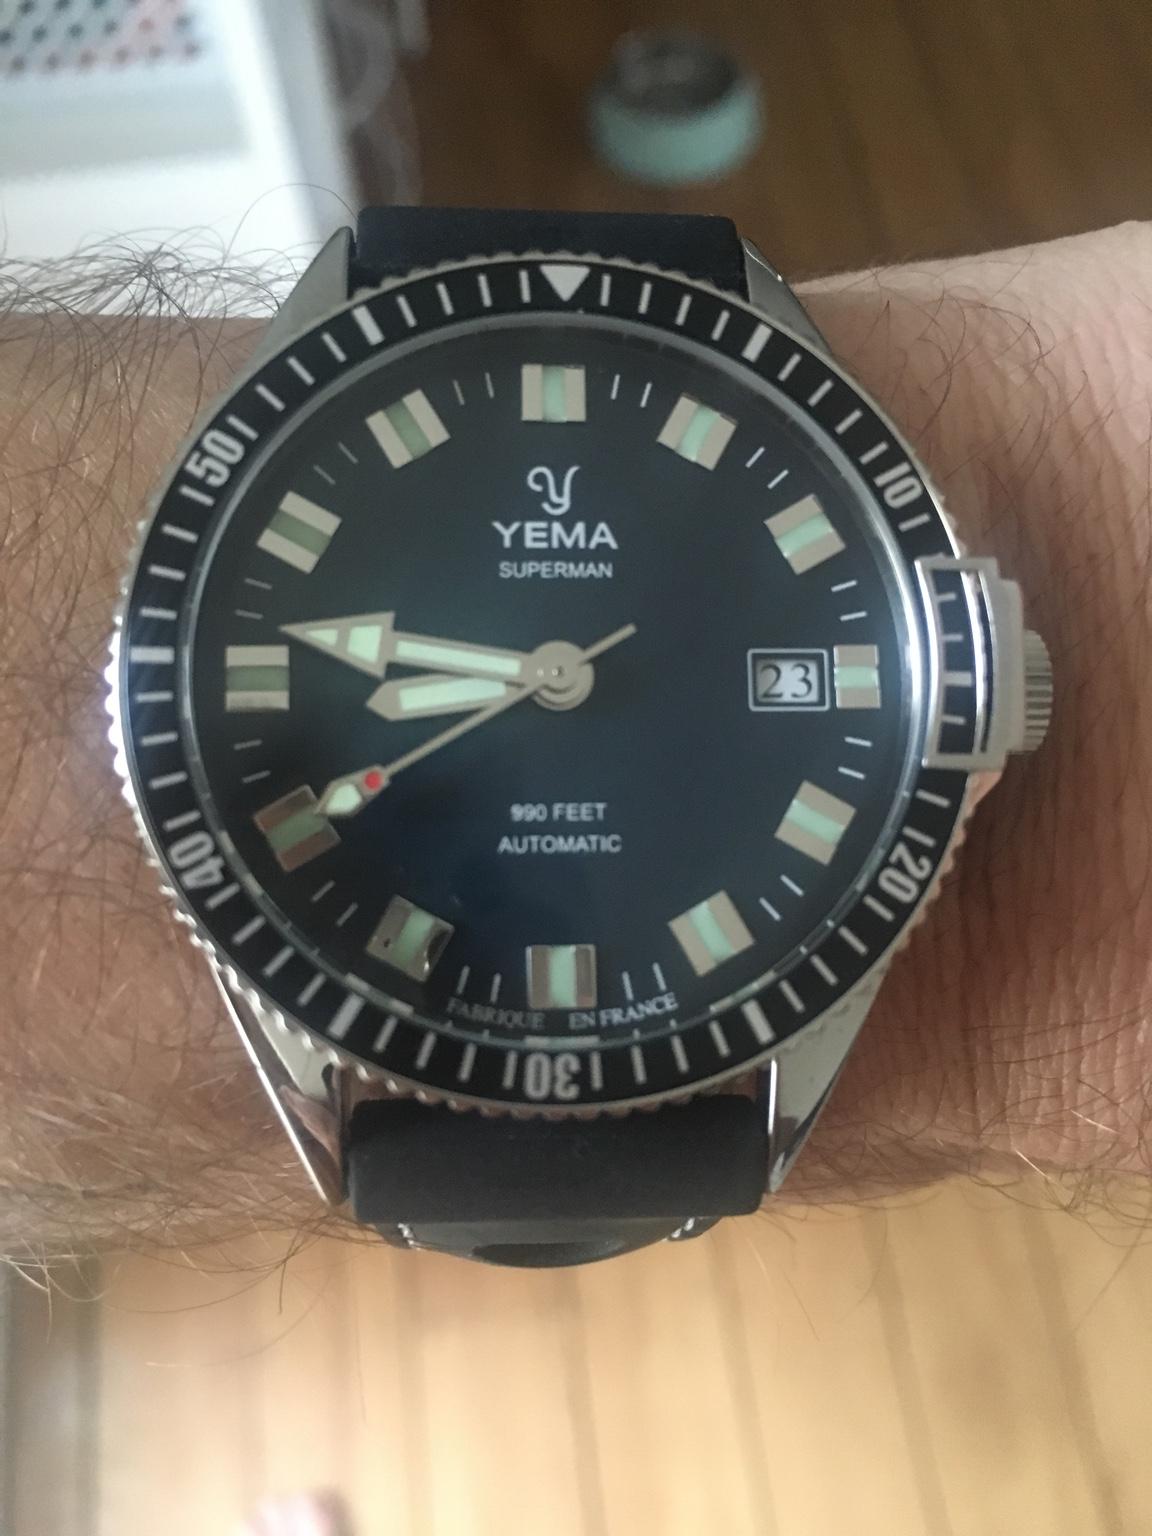 Yema Superman - Replica Watch Info